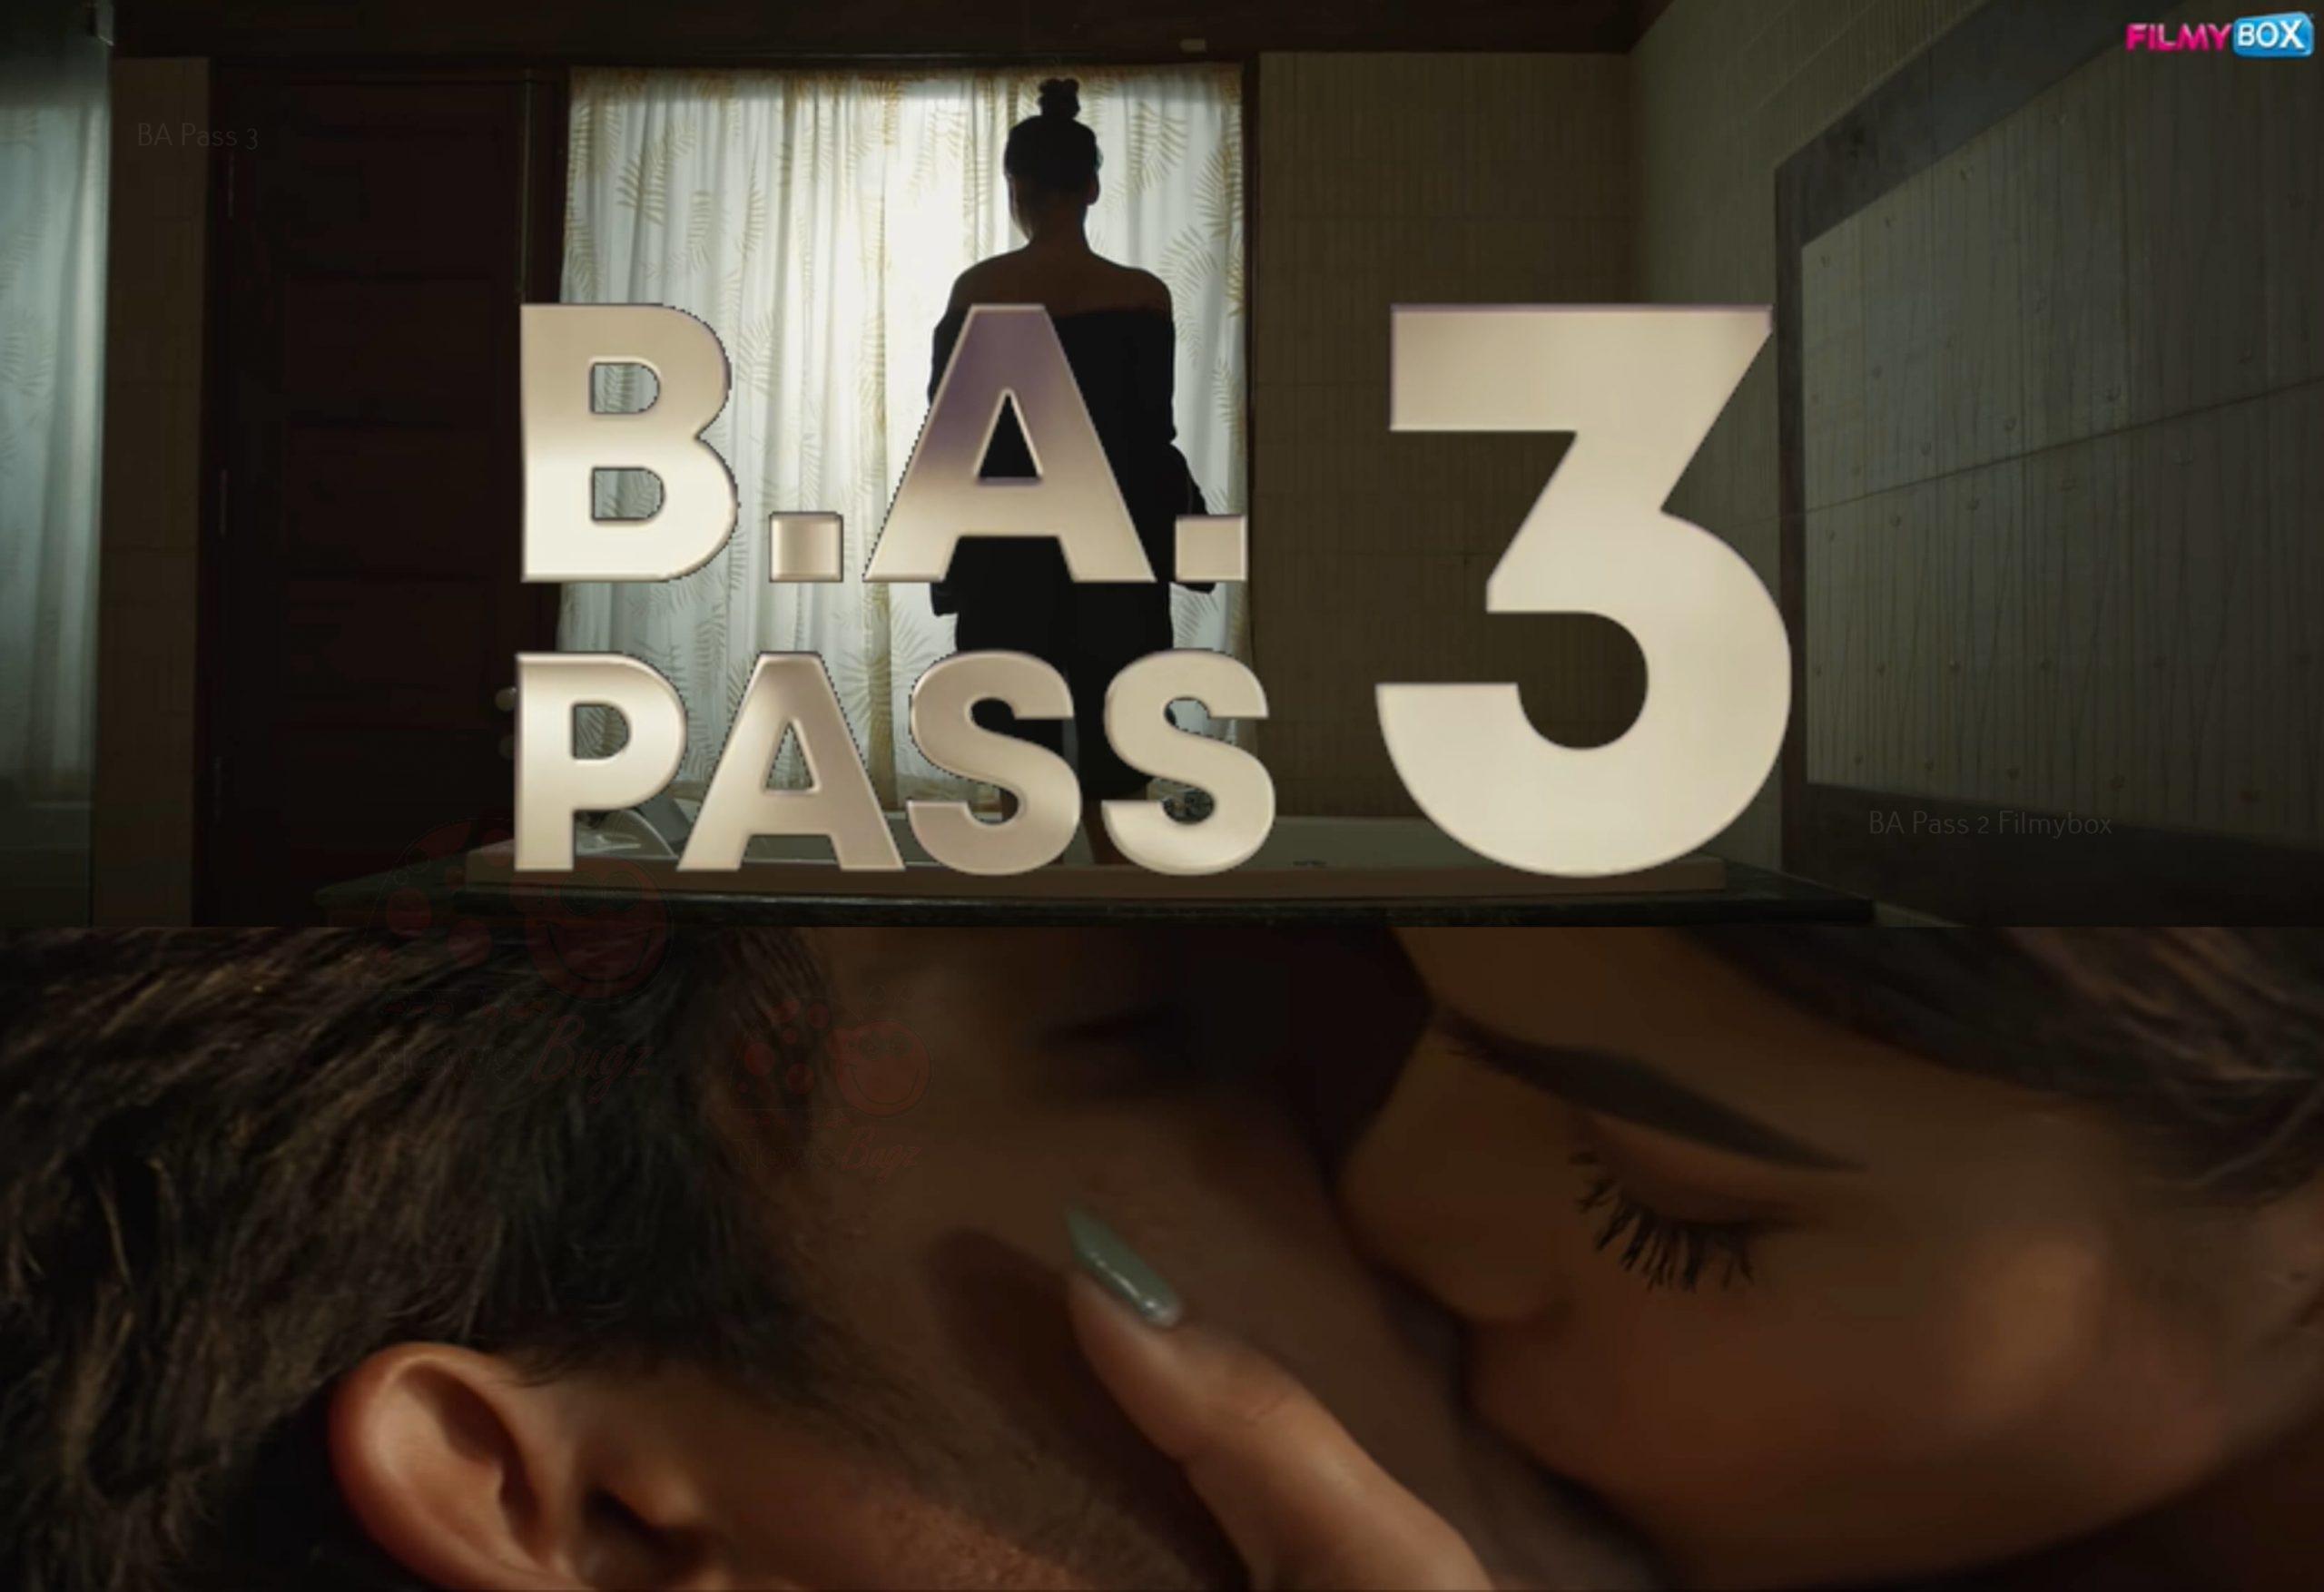 Download Ba Pass 3 Movie Full Hd Online For Free 2021 Telegram